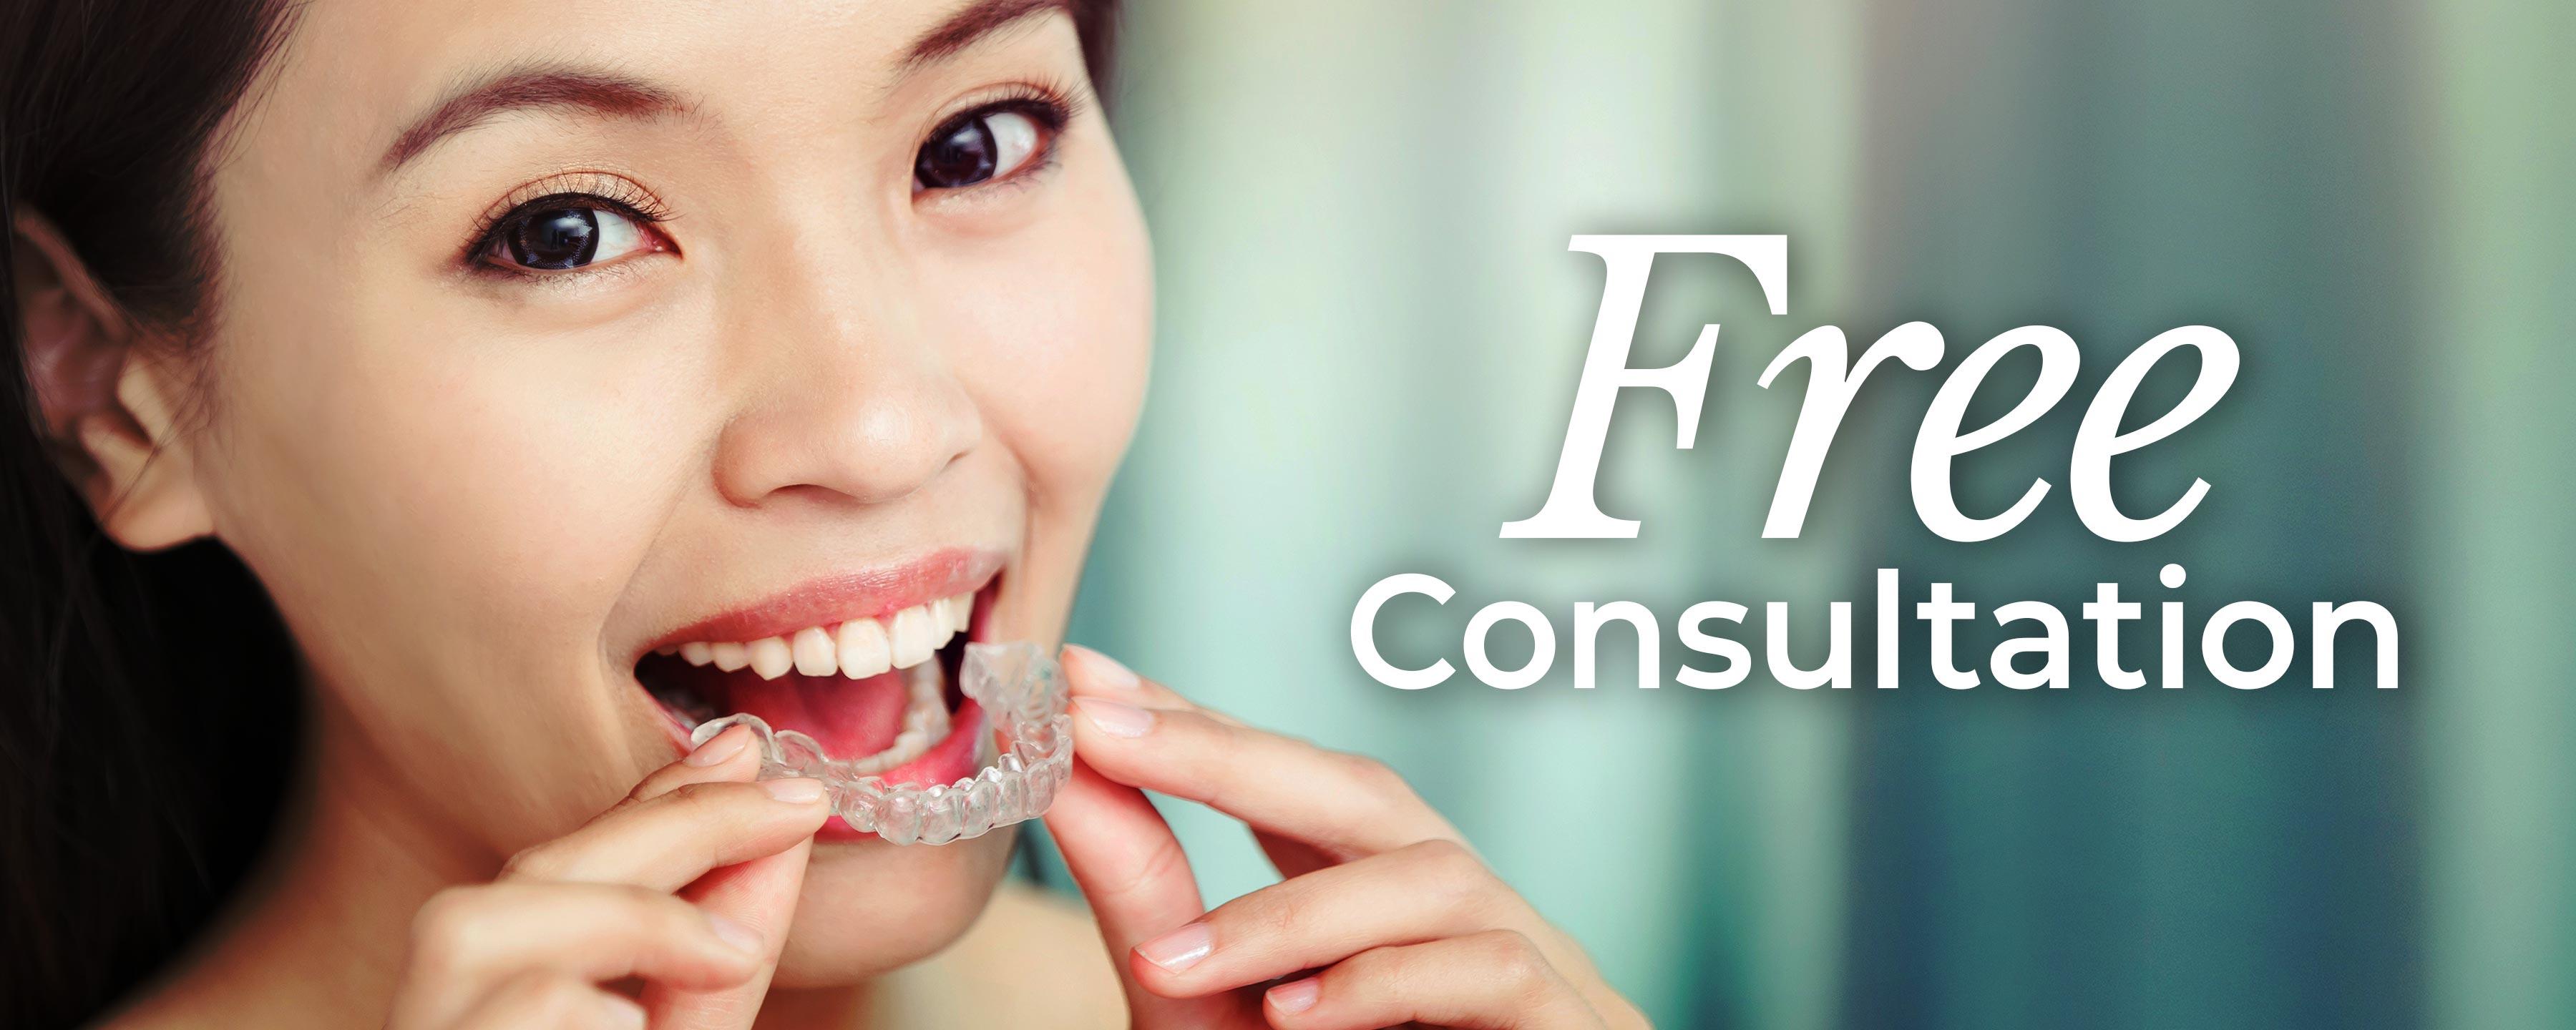 Free Invisalign® Consultation*